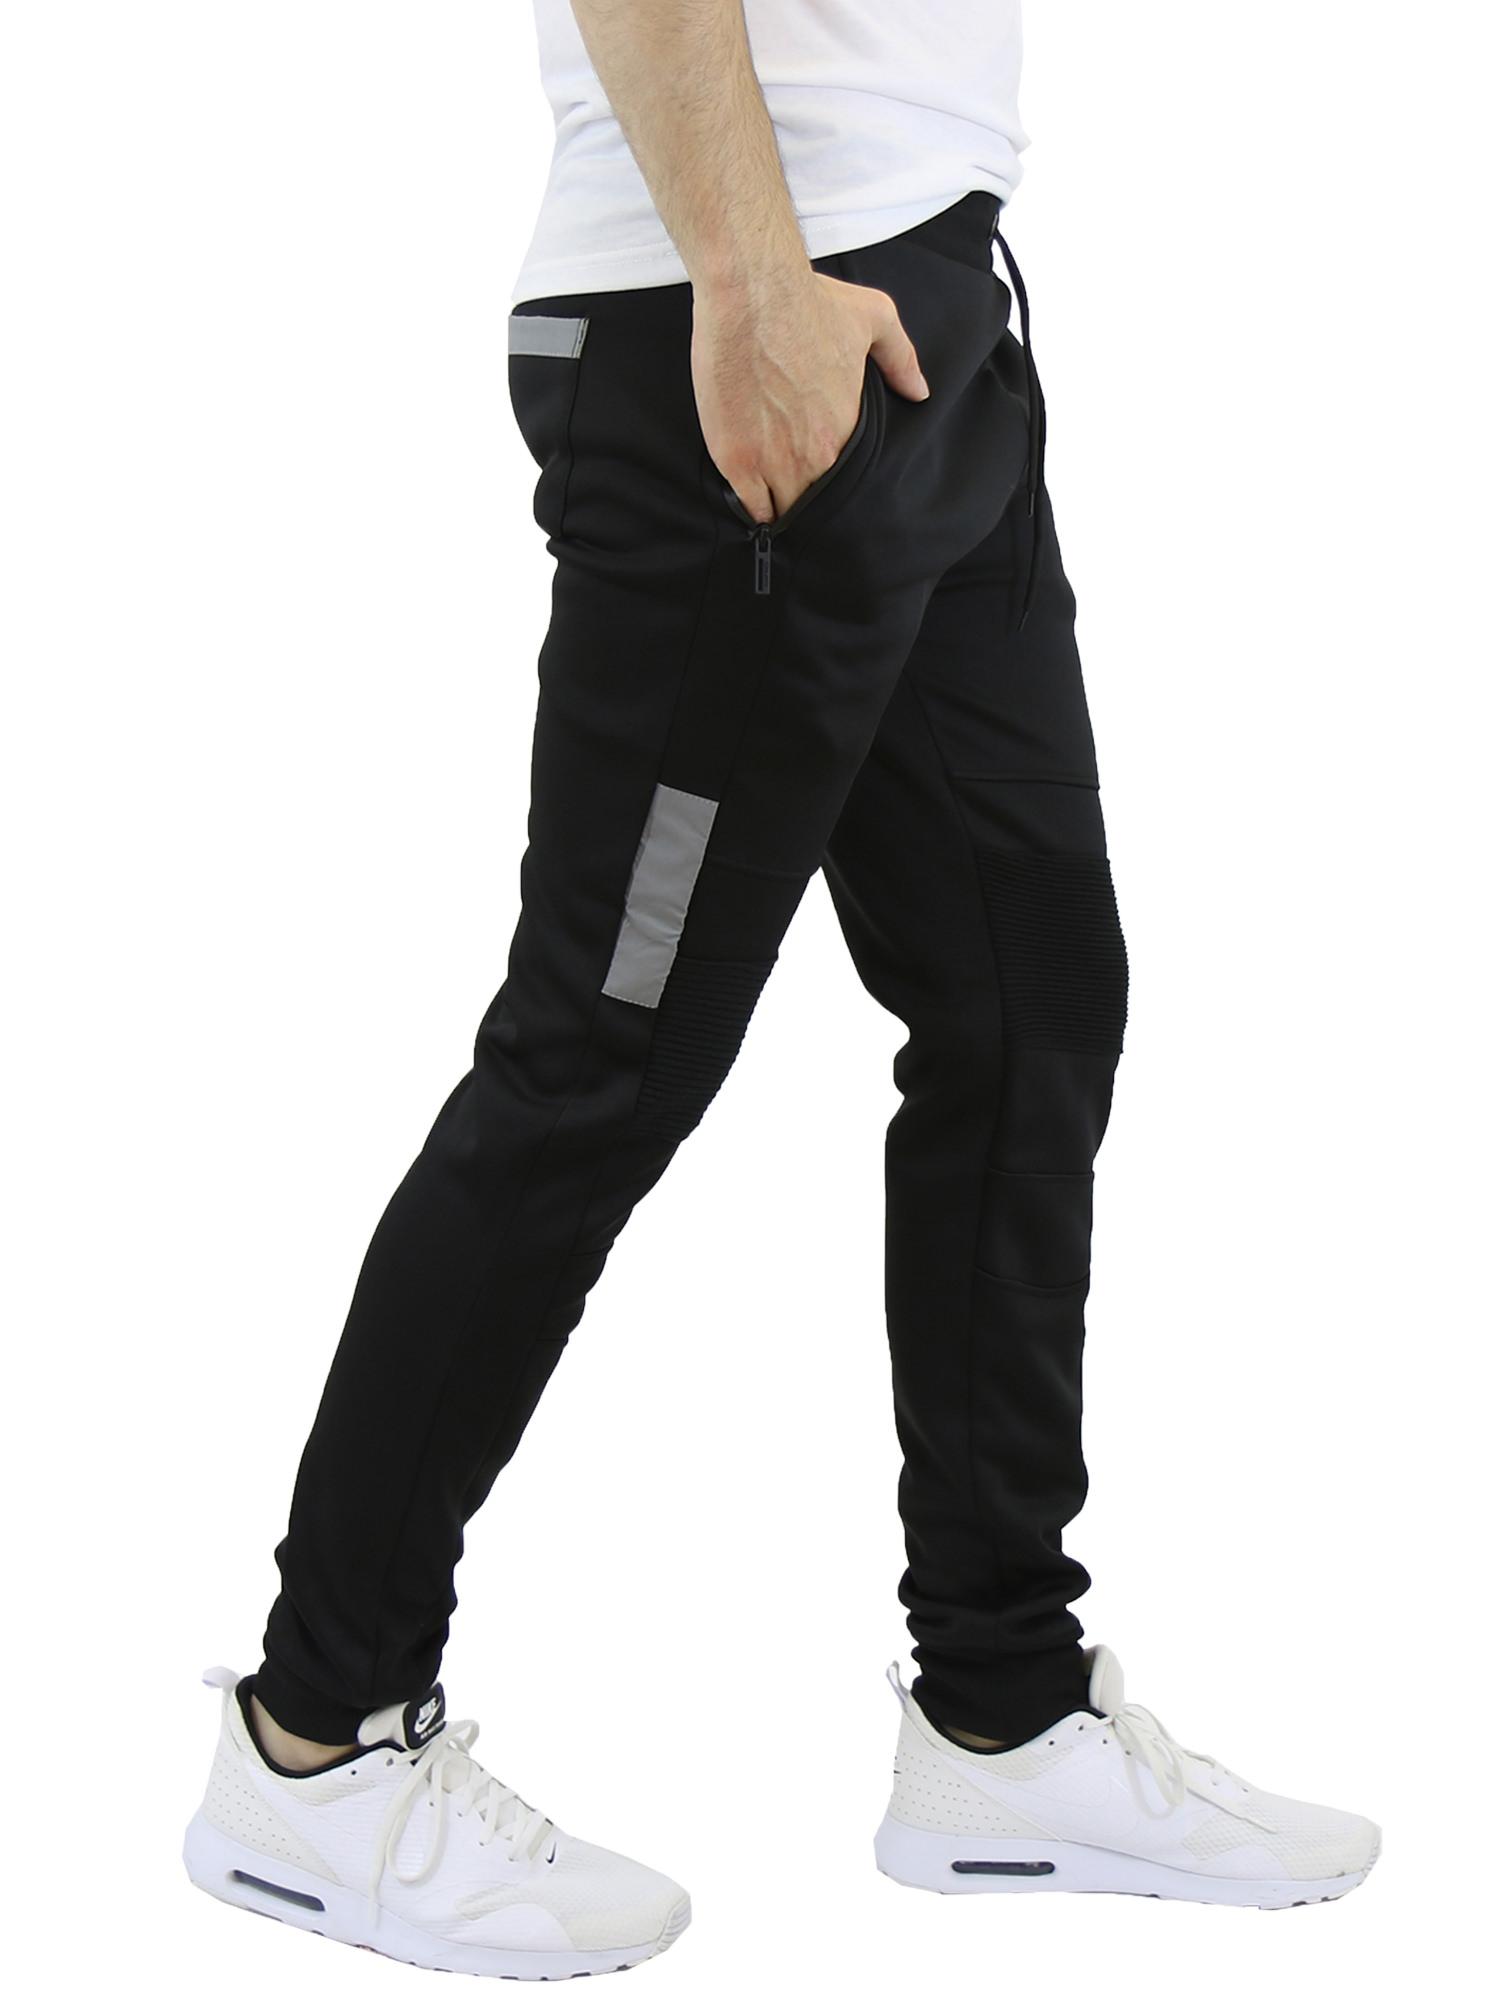 Men's Fleece-Lined Joggers with Zipper Pockets